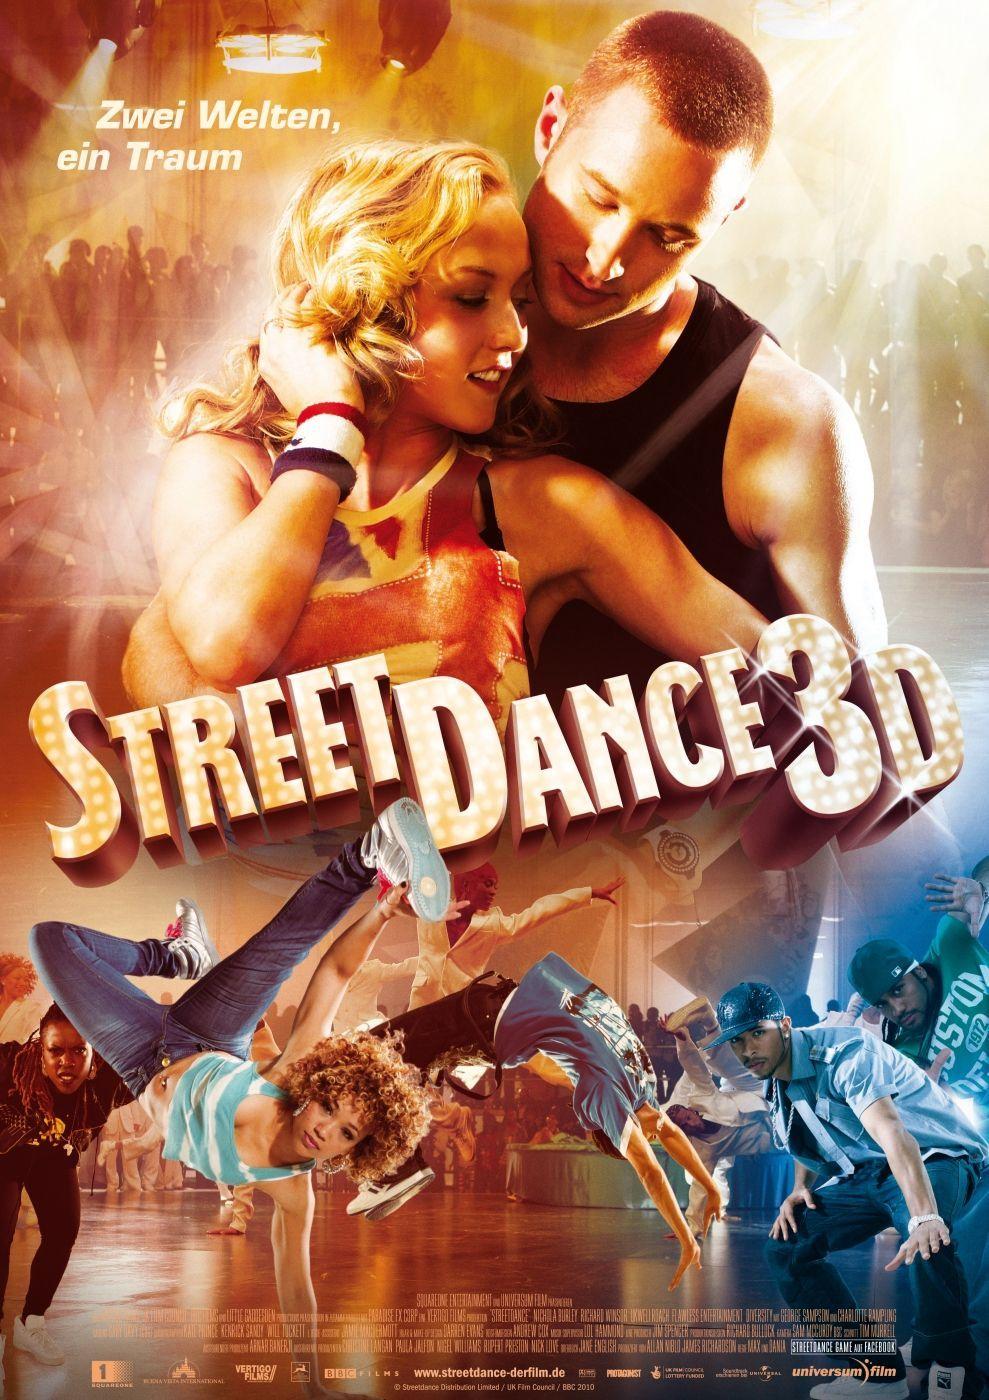 Streetdance 3d 2010 Street Dance Film Street Dance Streetdance 3d